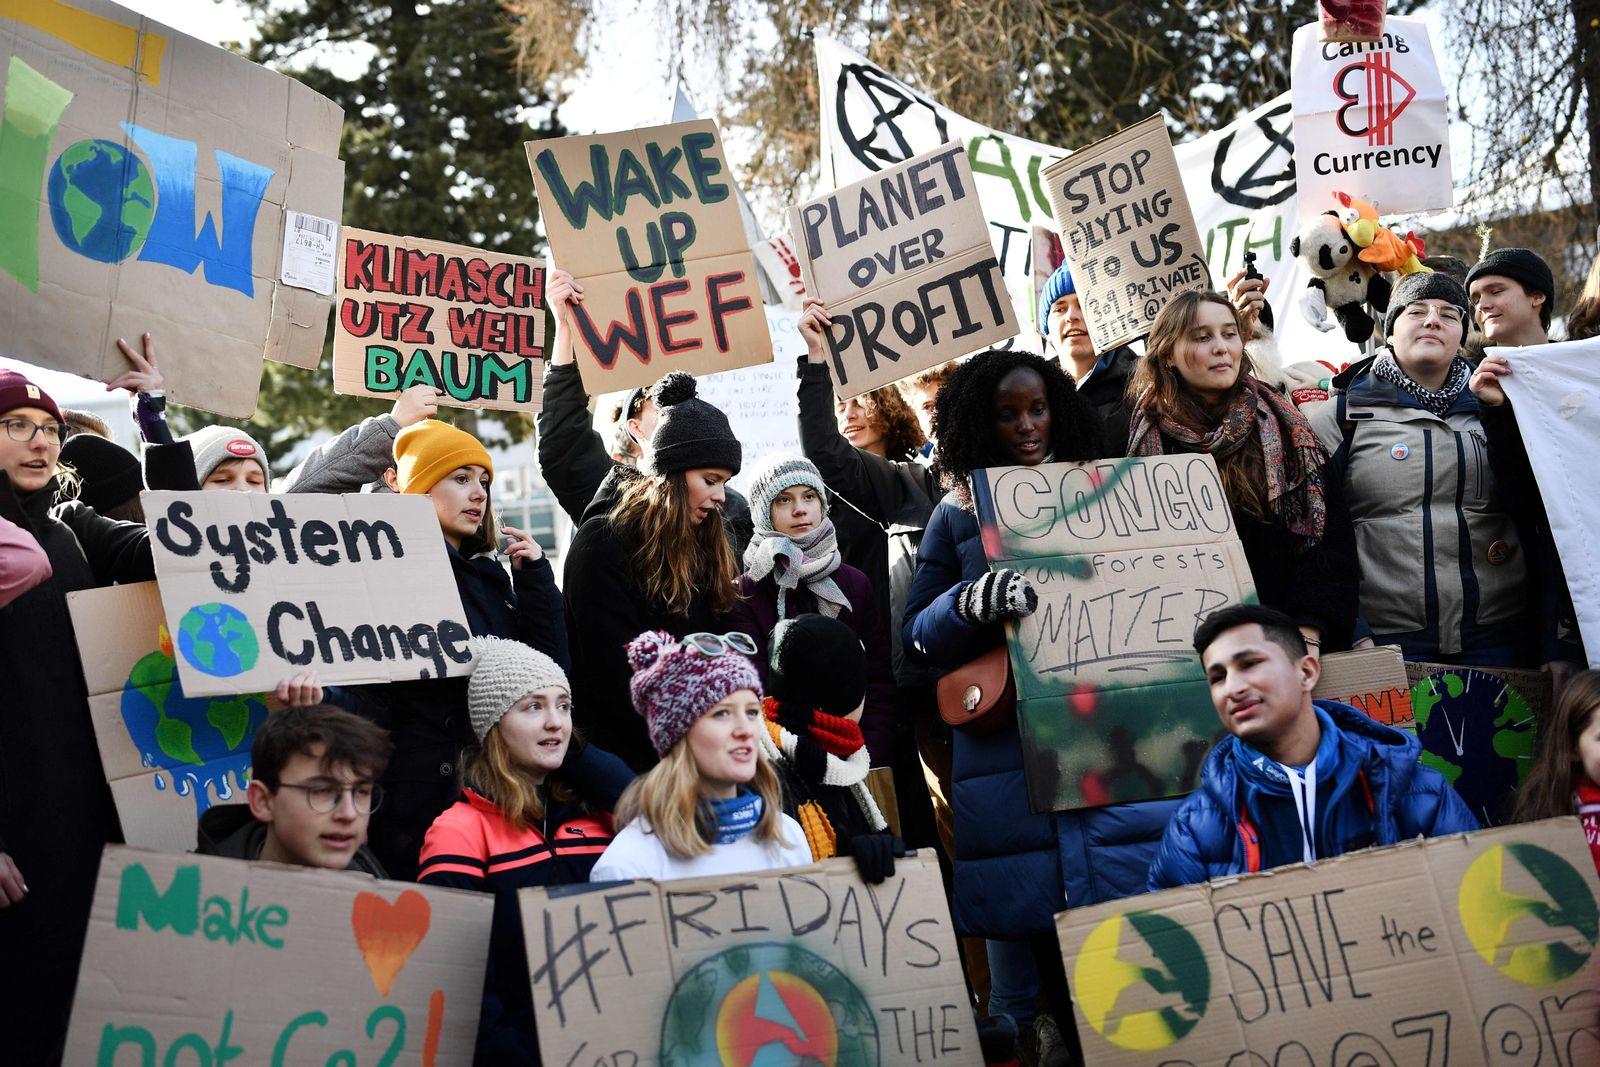 TOPSHOT-SWITZERLAND-POLITICS-ECONOMY-CLIMATE-YOUTH-DEMO